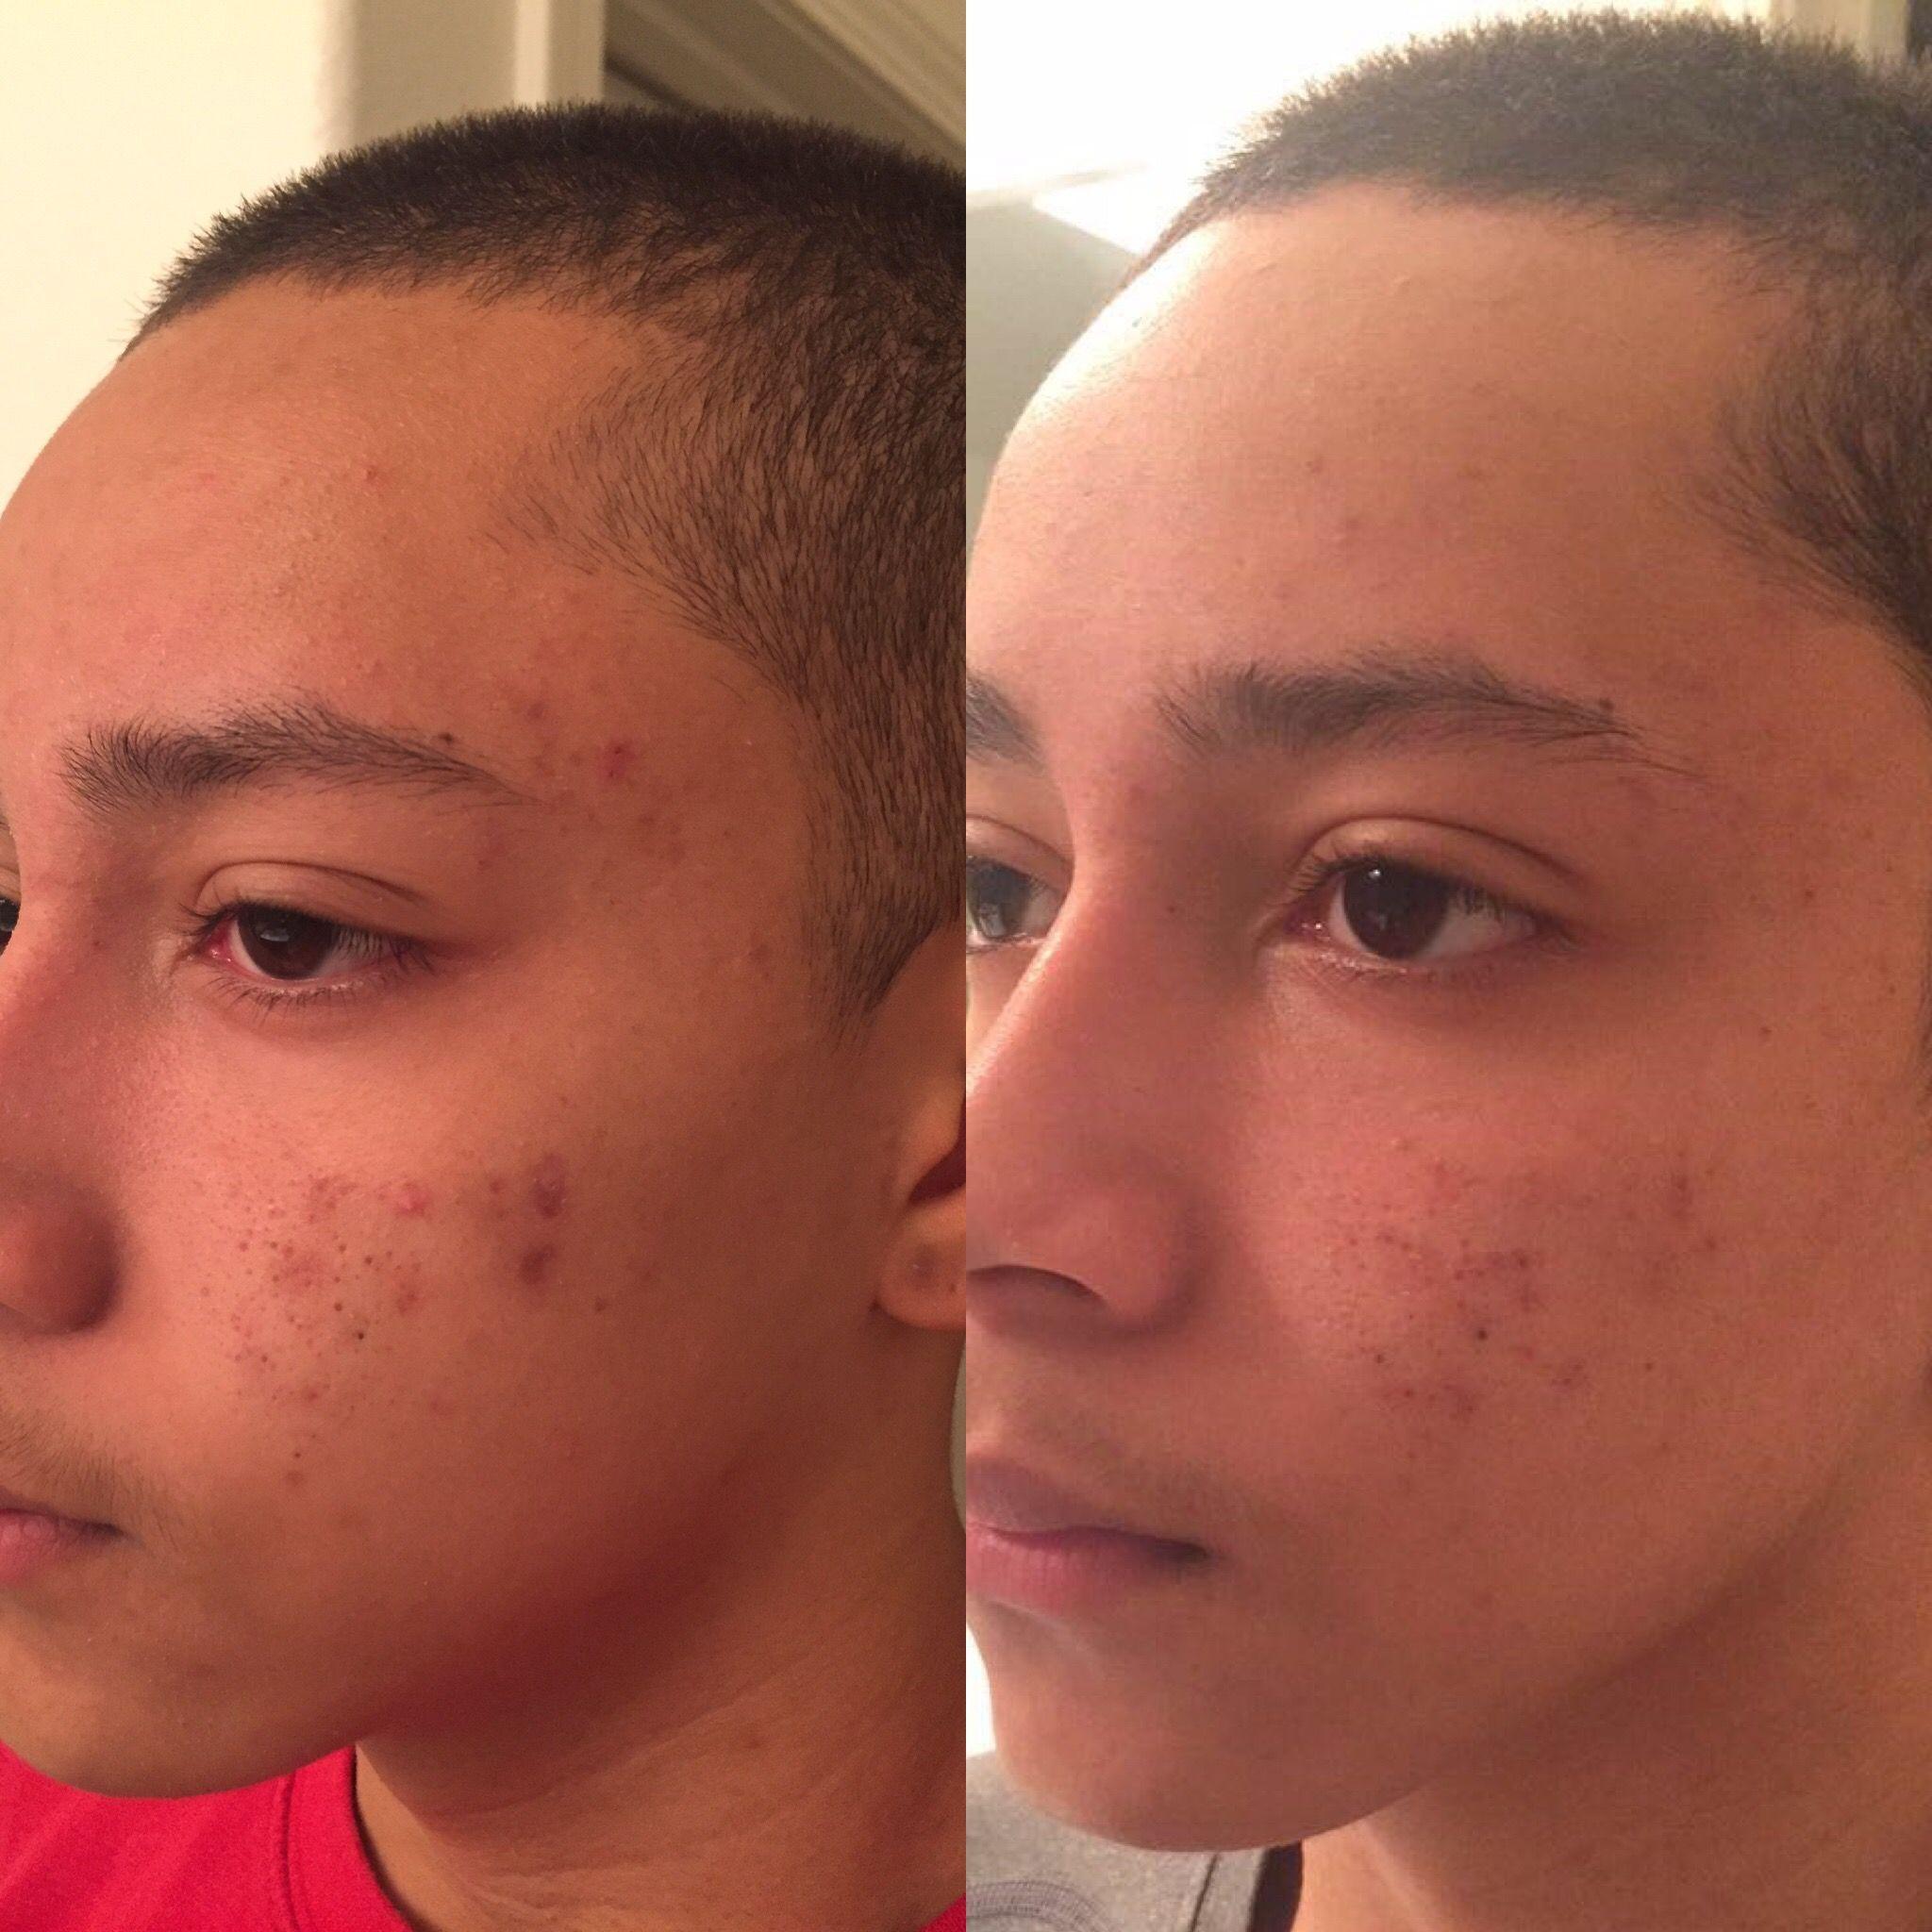 My Son S 60 Day Results His Acne Is Clearing Up Herbalifeclarify Order Today Www Goherbalife Com Lisaanderson415 Herbal Herbalife Nutrition Skin Herbalife